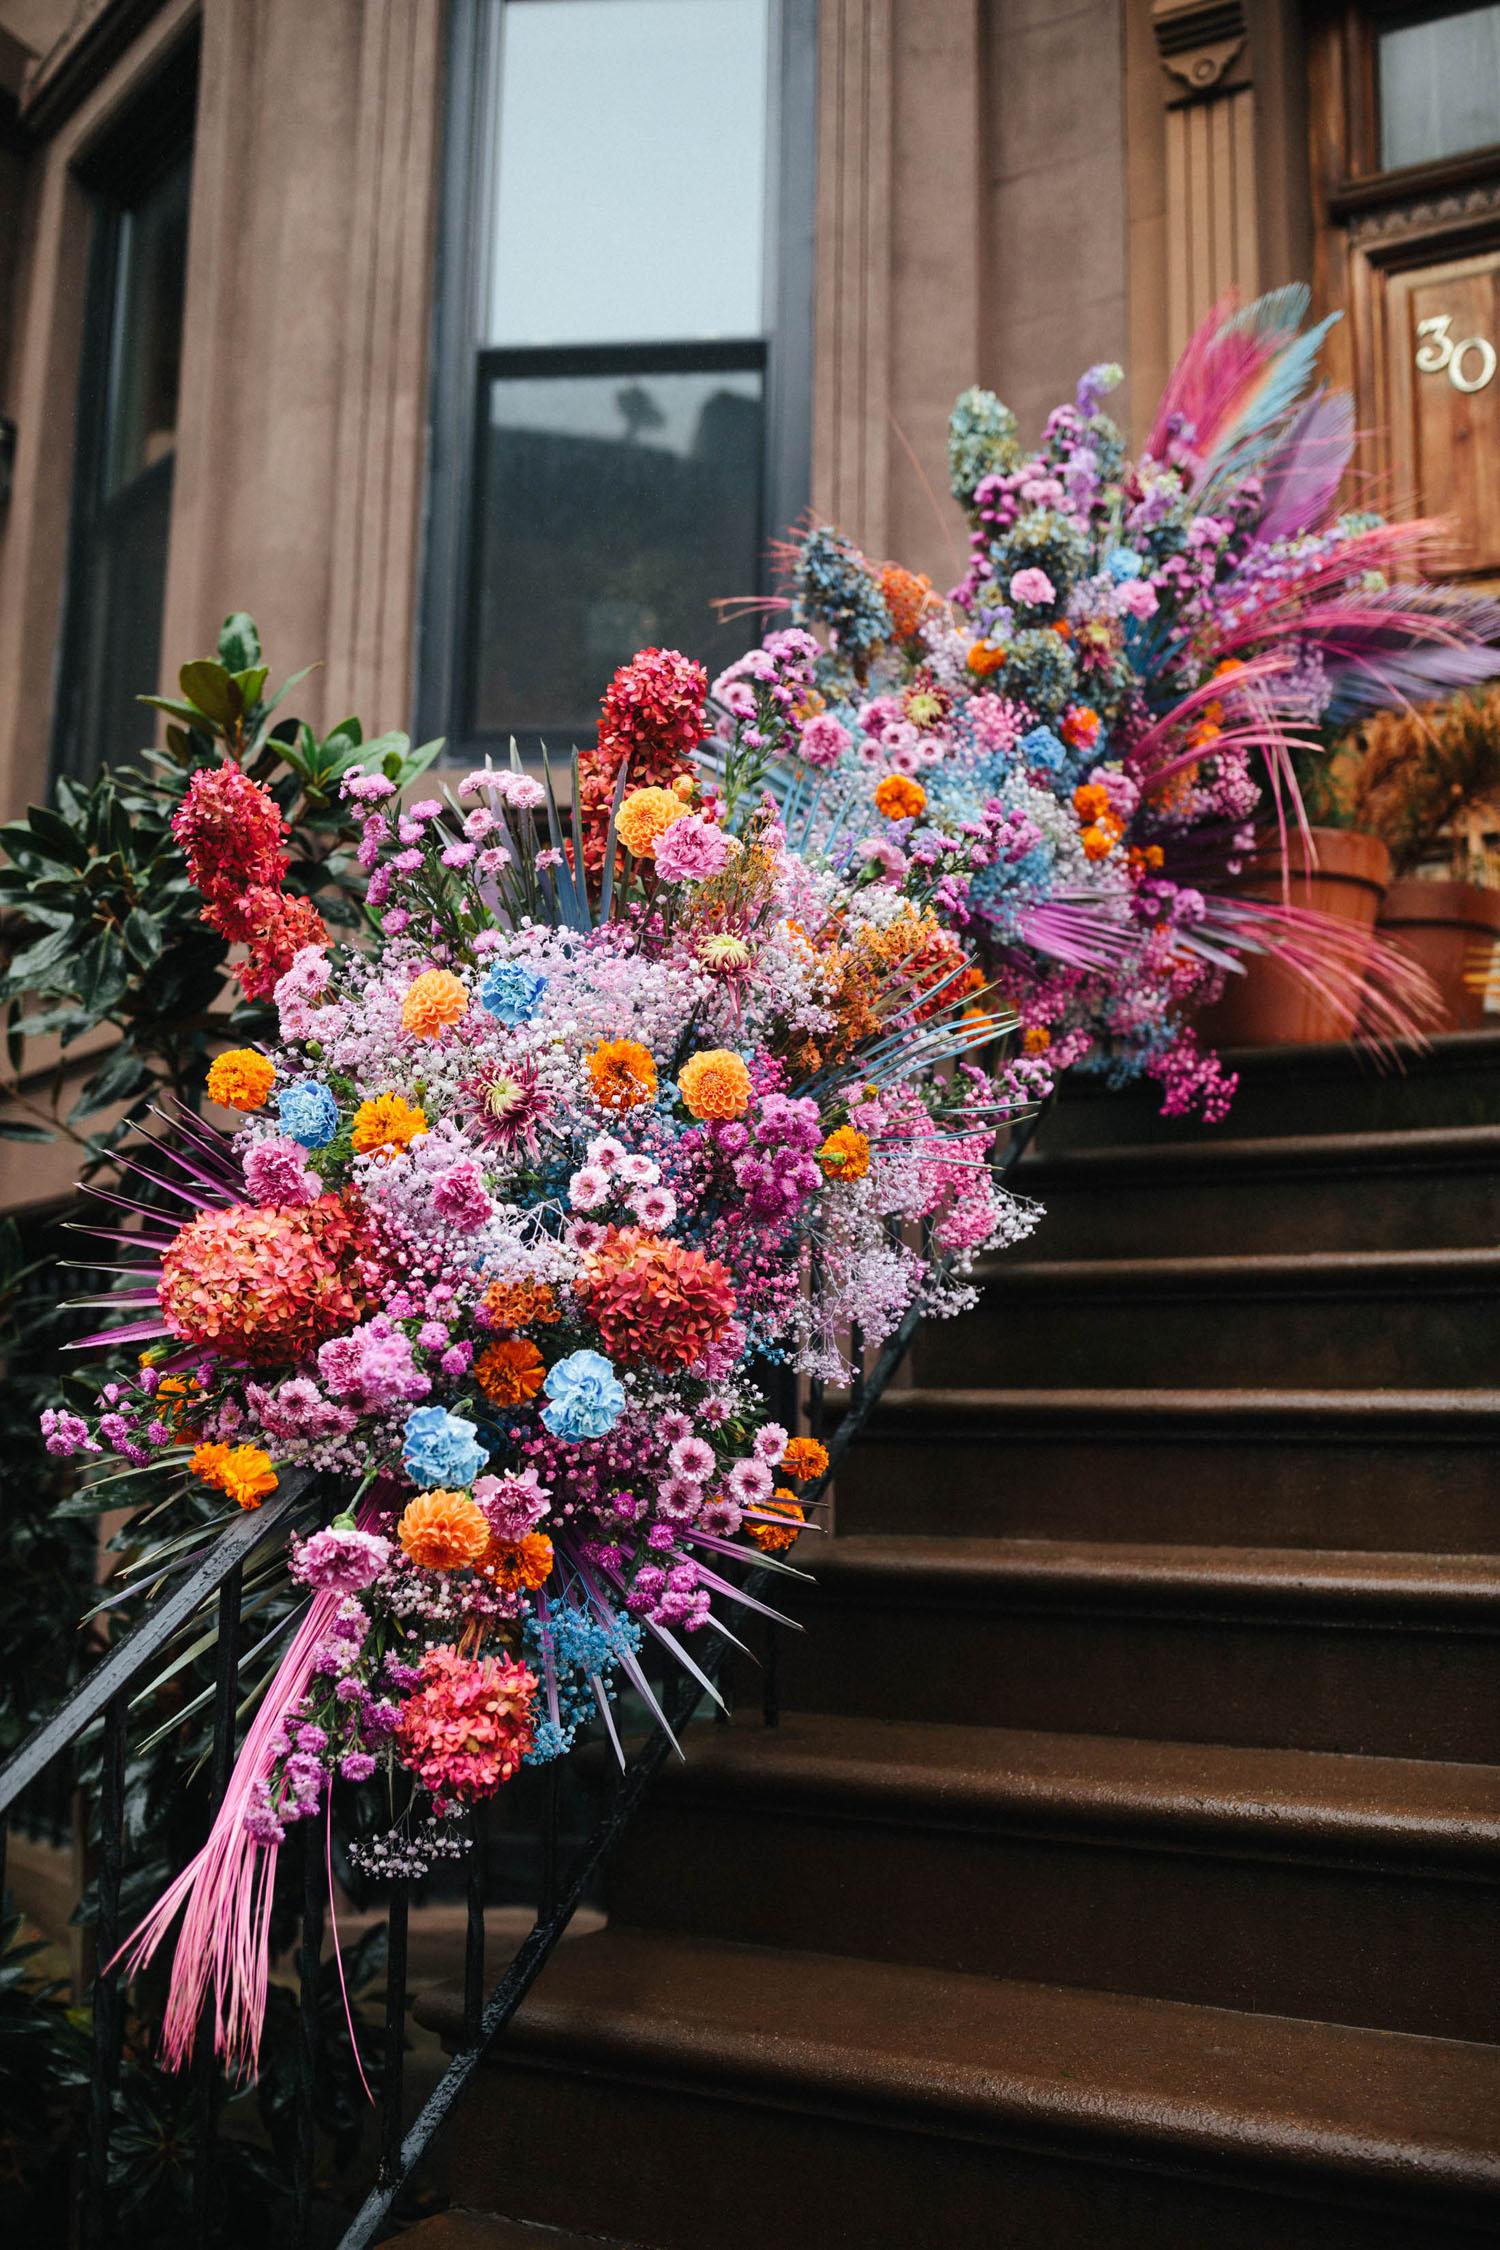 installation florale d'inspiration irisée